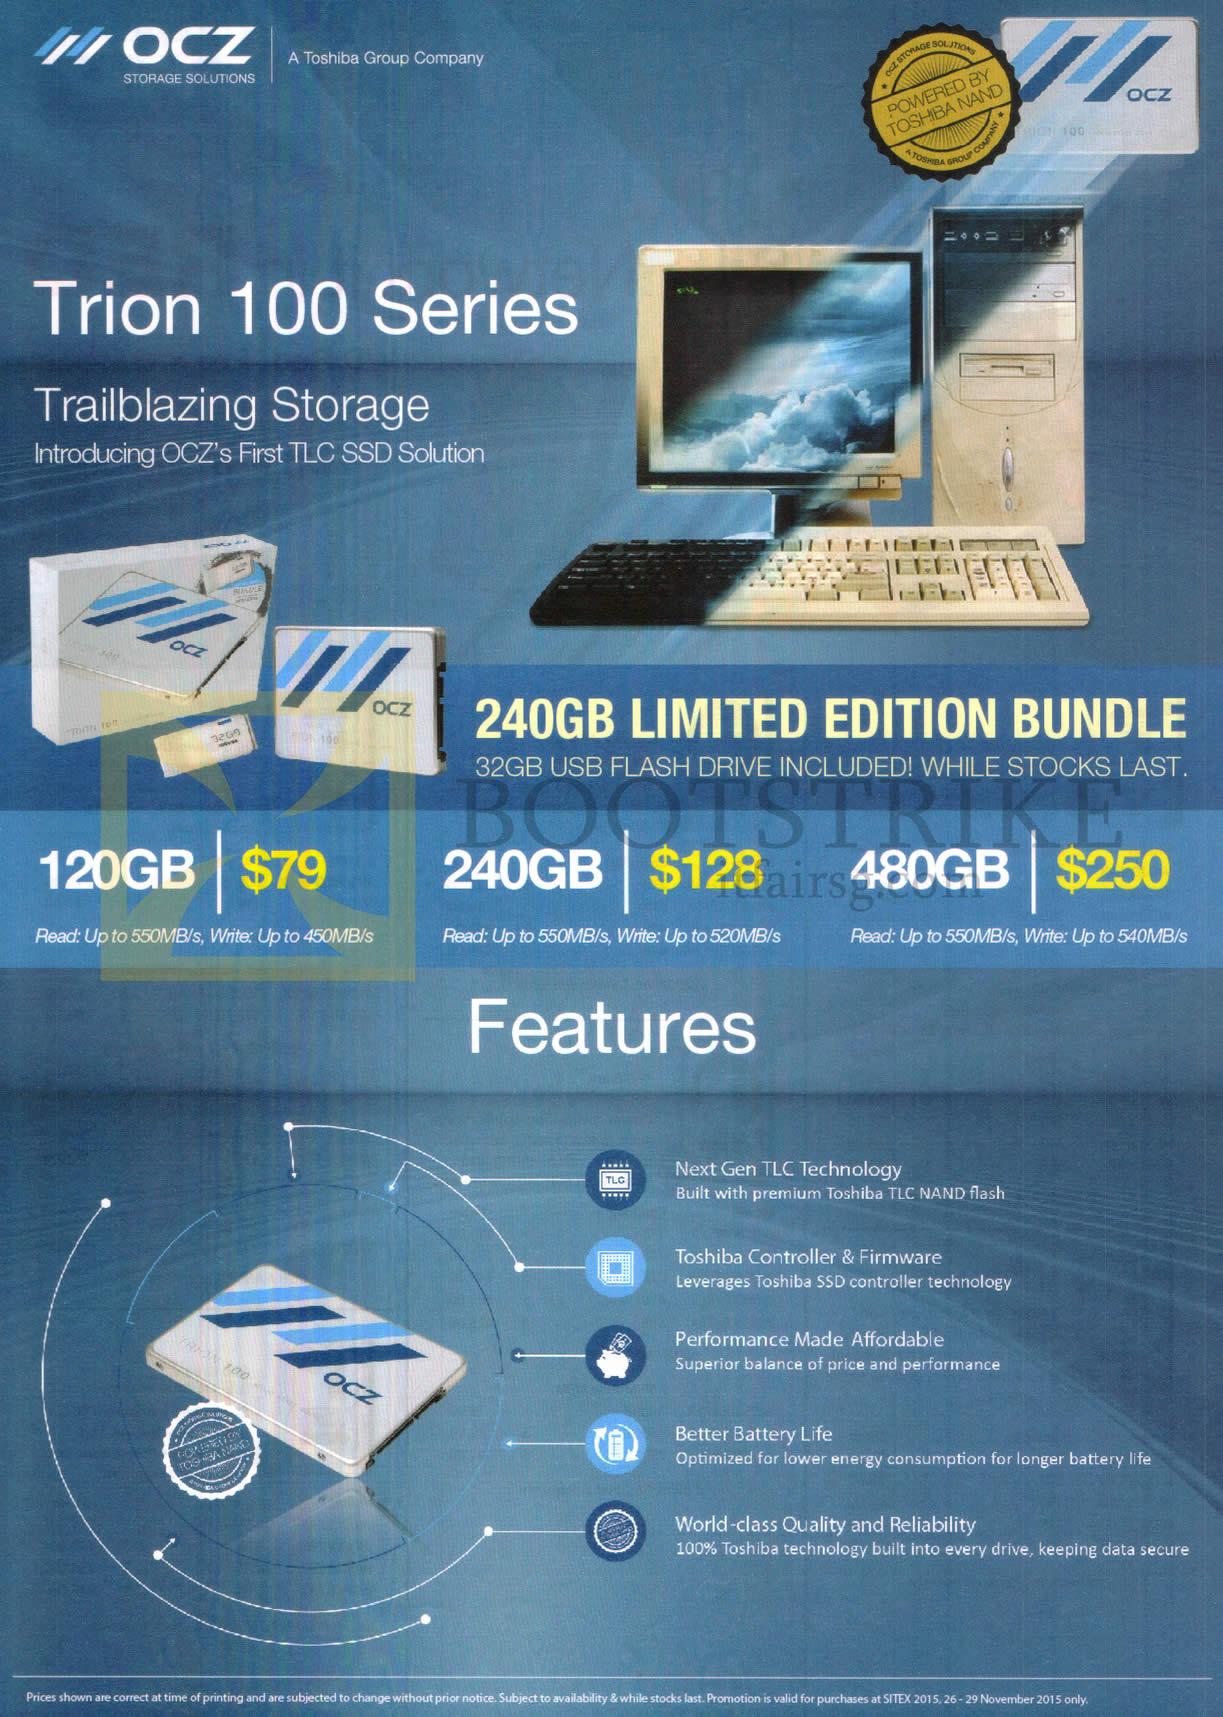 SITEX 2015 price list image brochure of OCZ Storage Solutions Trion 100 Series SSD 120GB, 240GB, 480GB